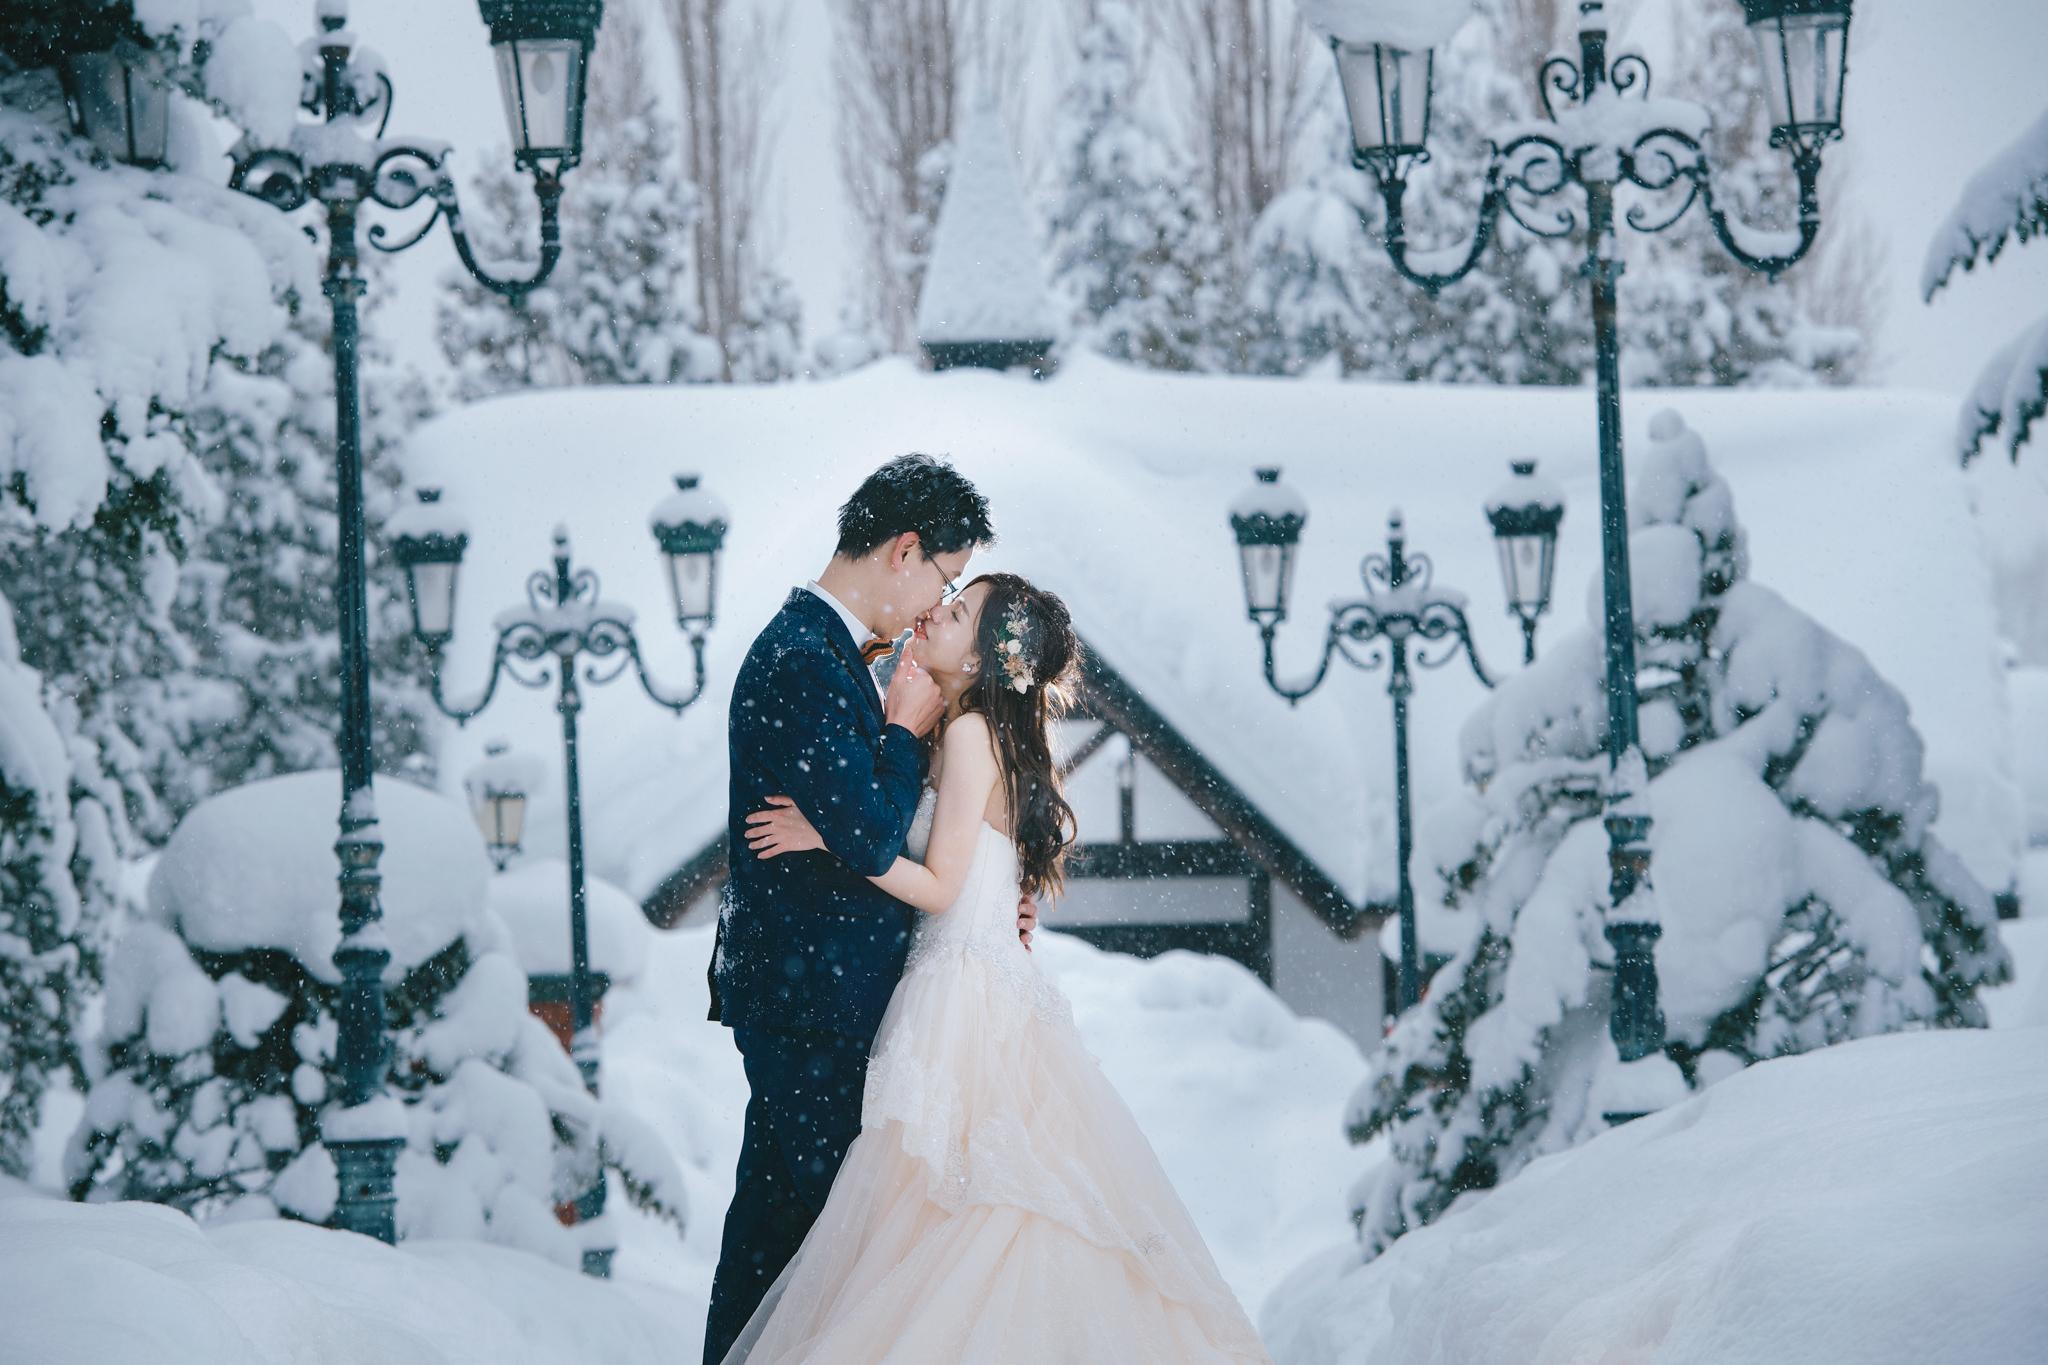 東法, Donfer, Donfer Photography, EASTERN WEDDING, 海外婚紗, 北海道婚紗, Hokkaido